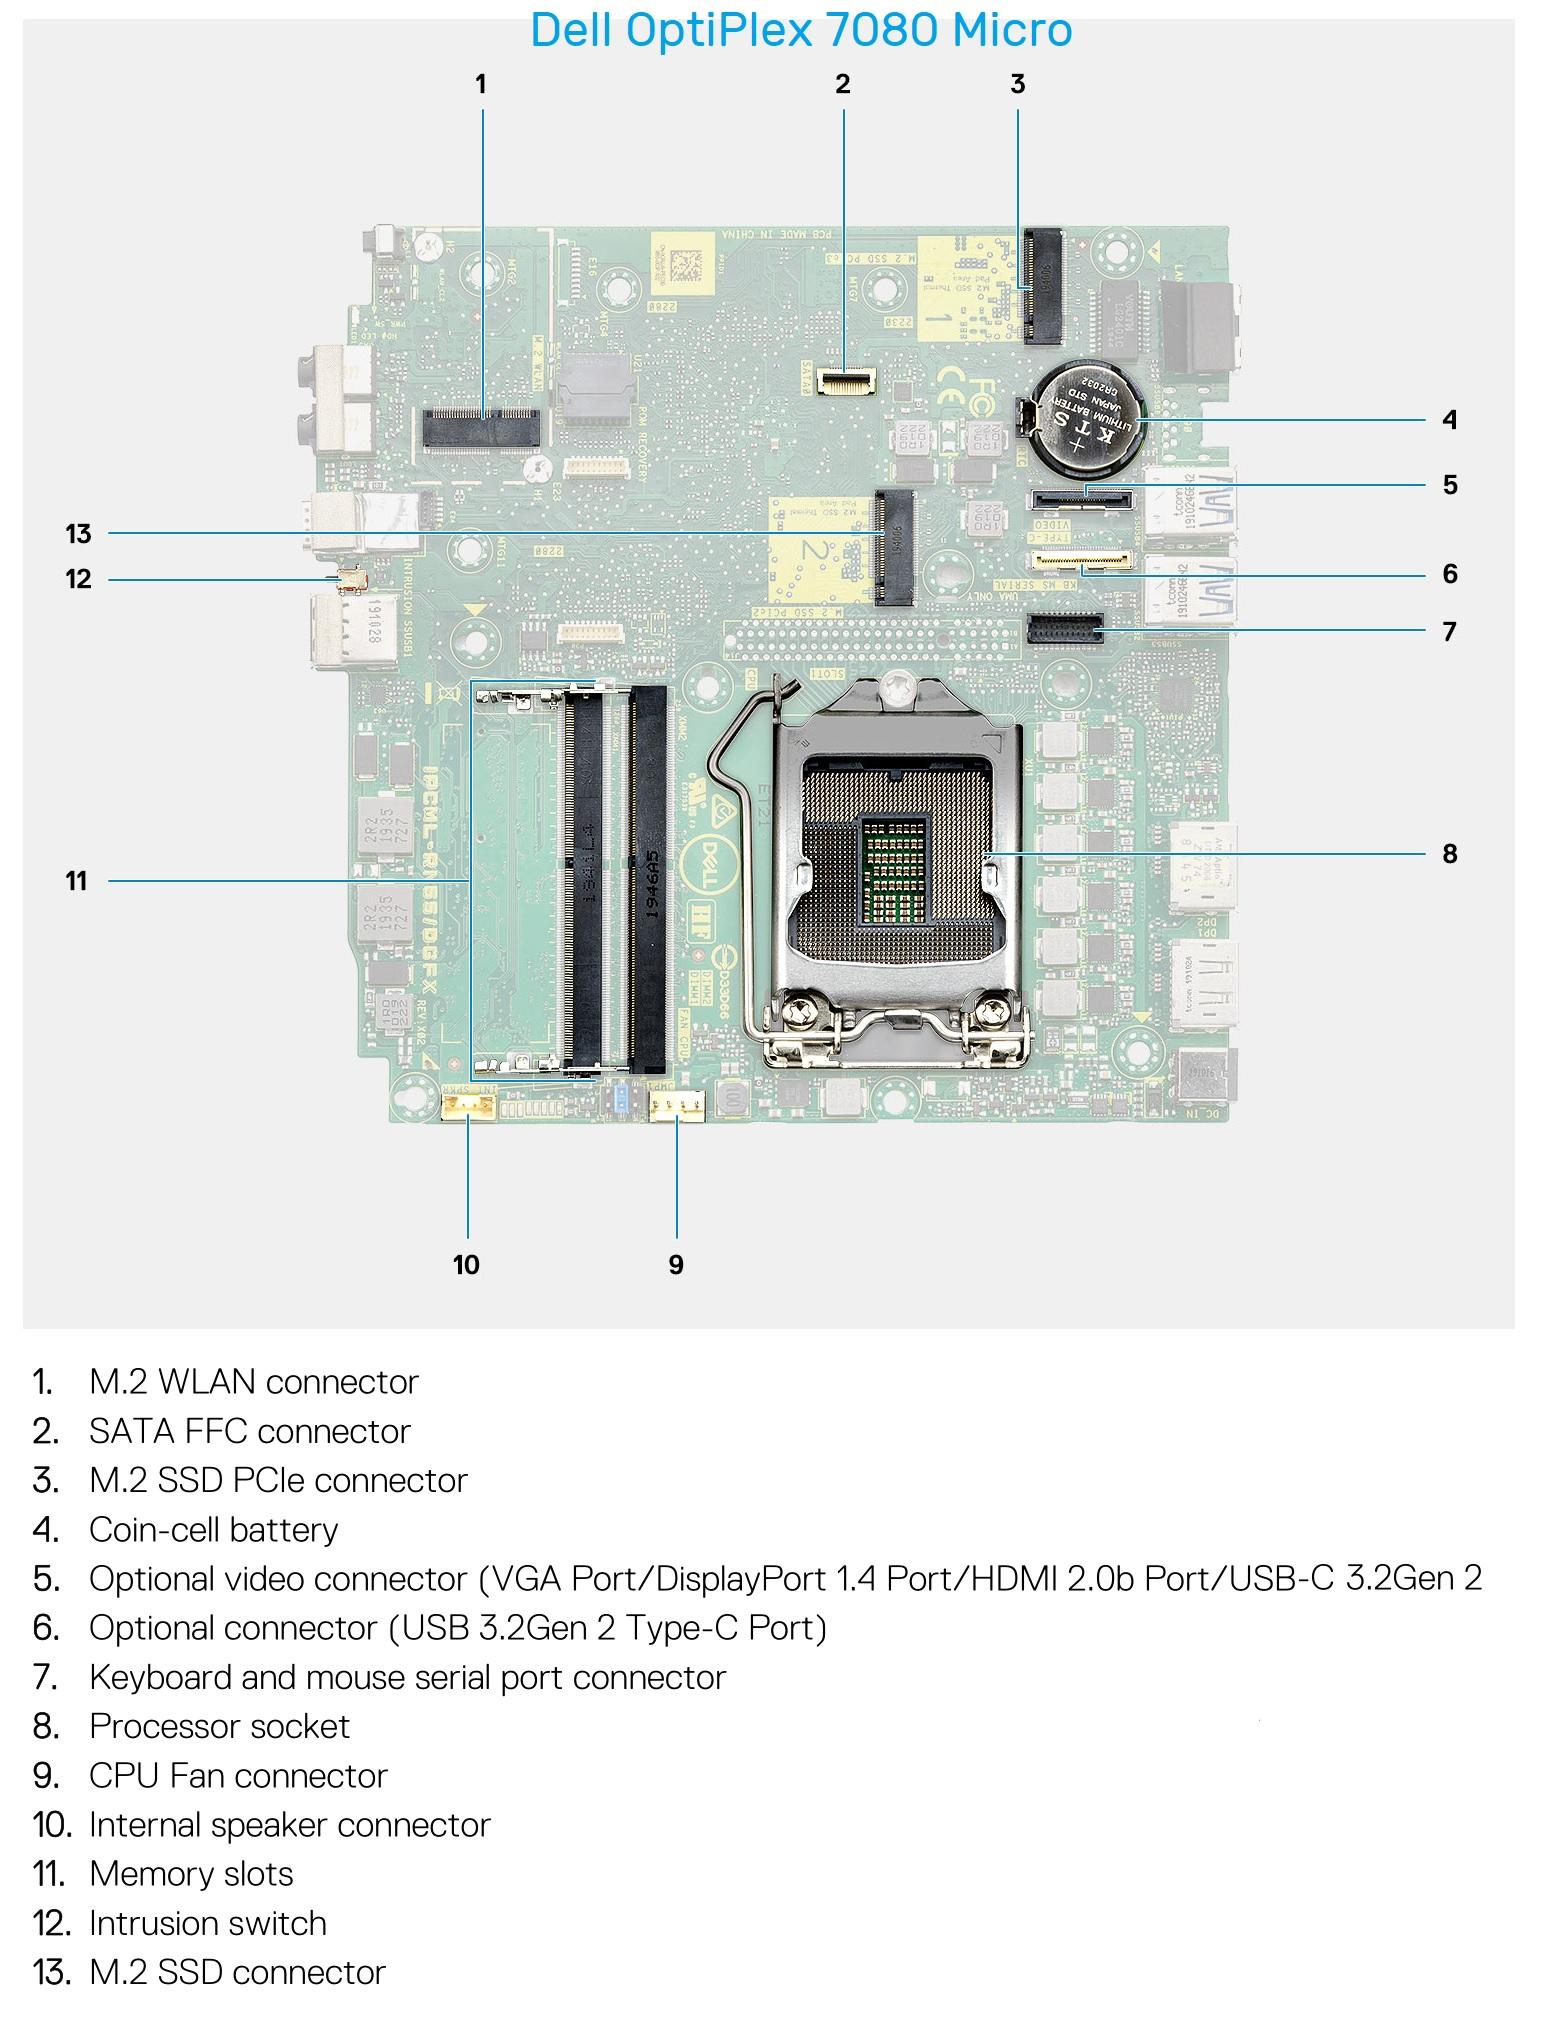 Dell_OptiPlex_7080M_motherboard.jpg motherboard layout